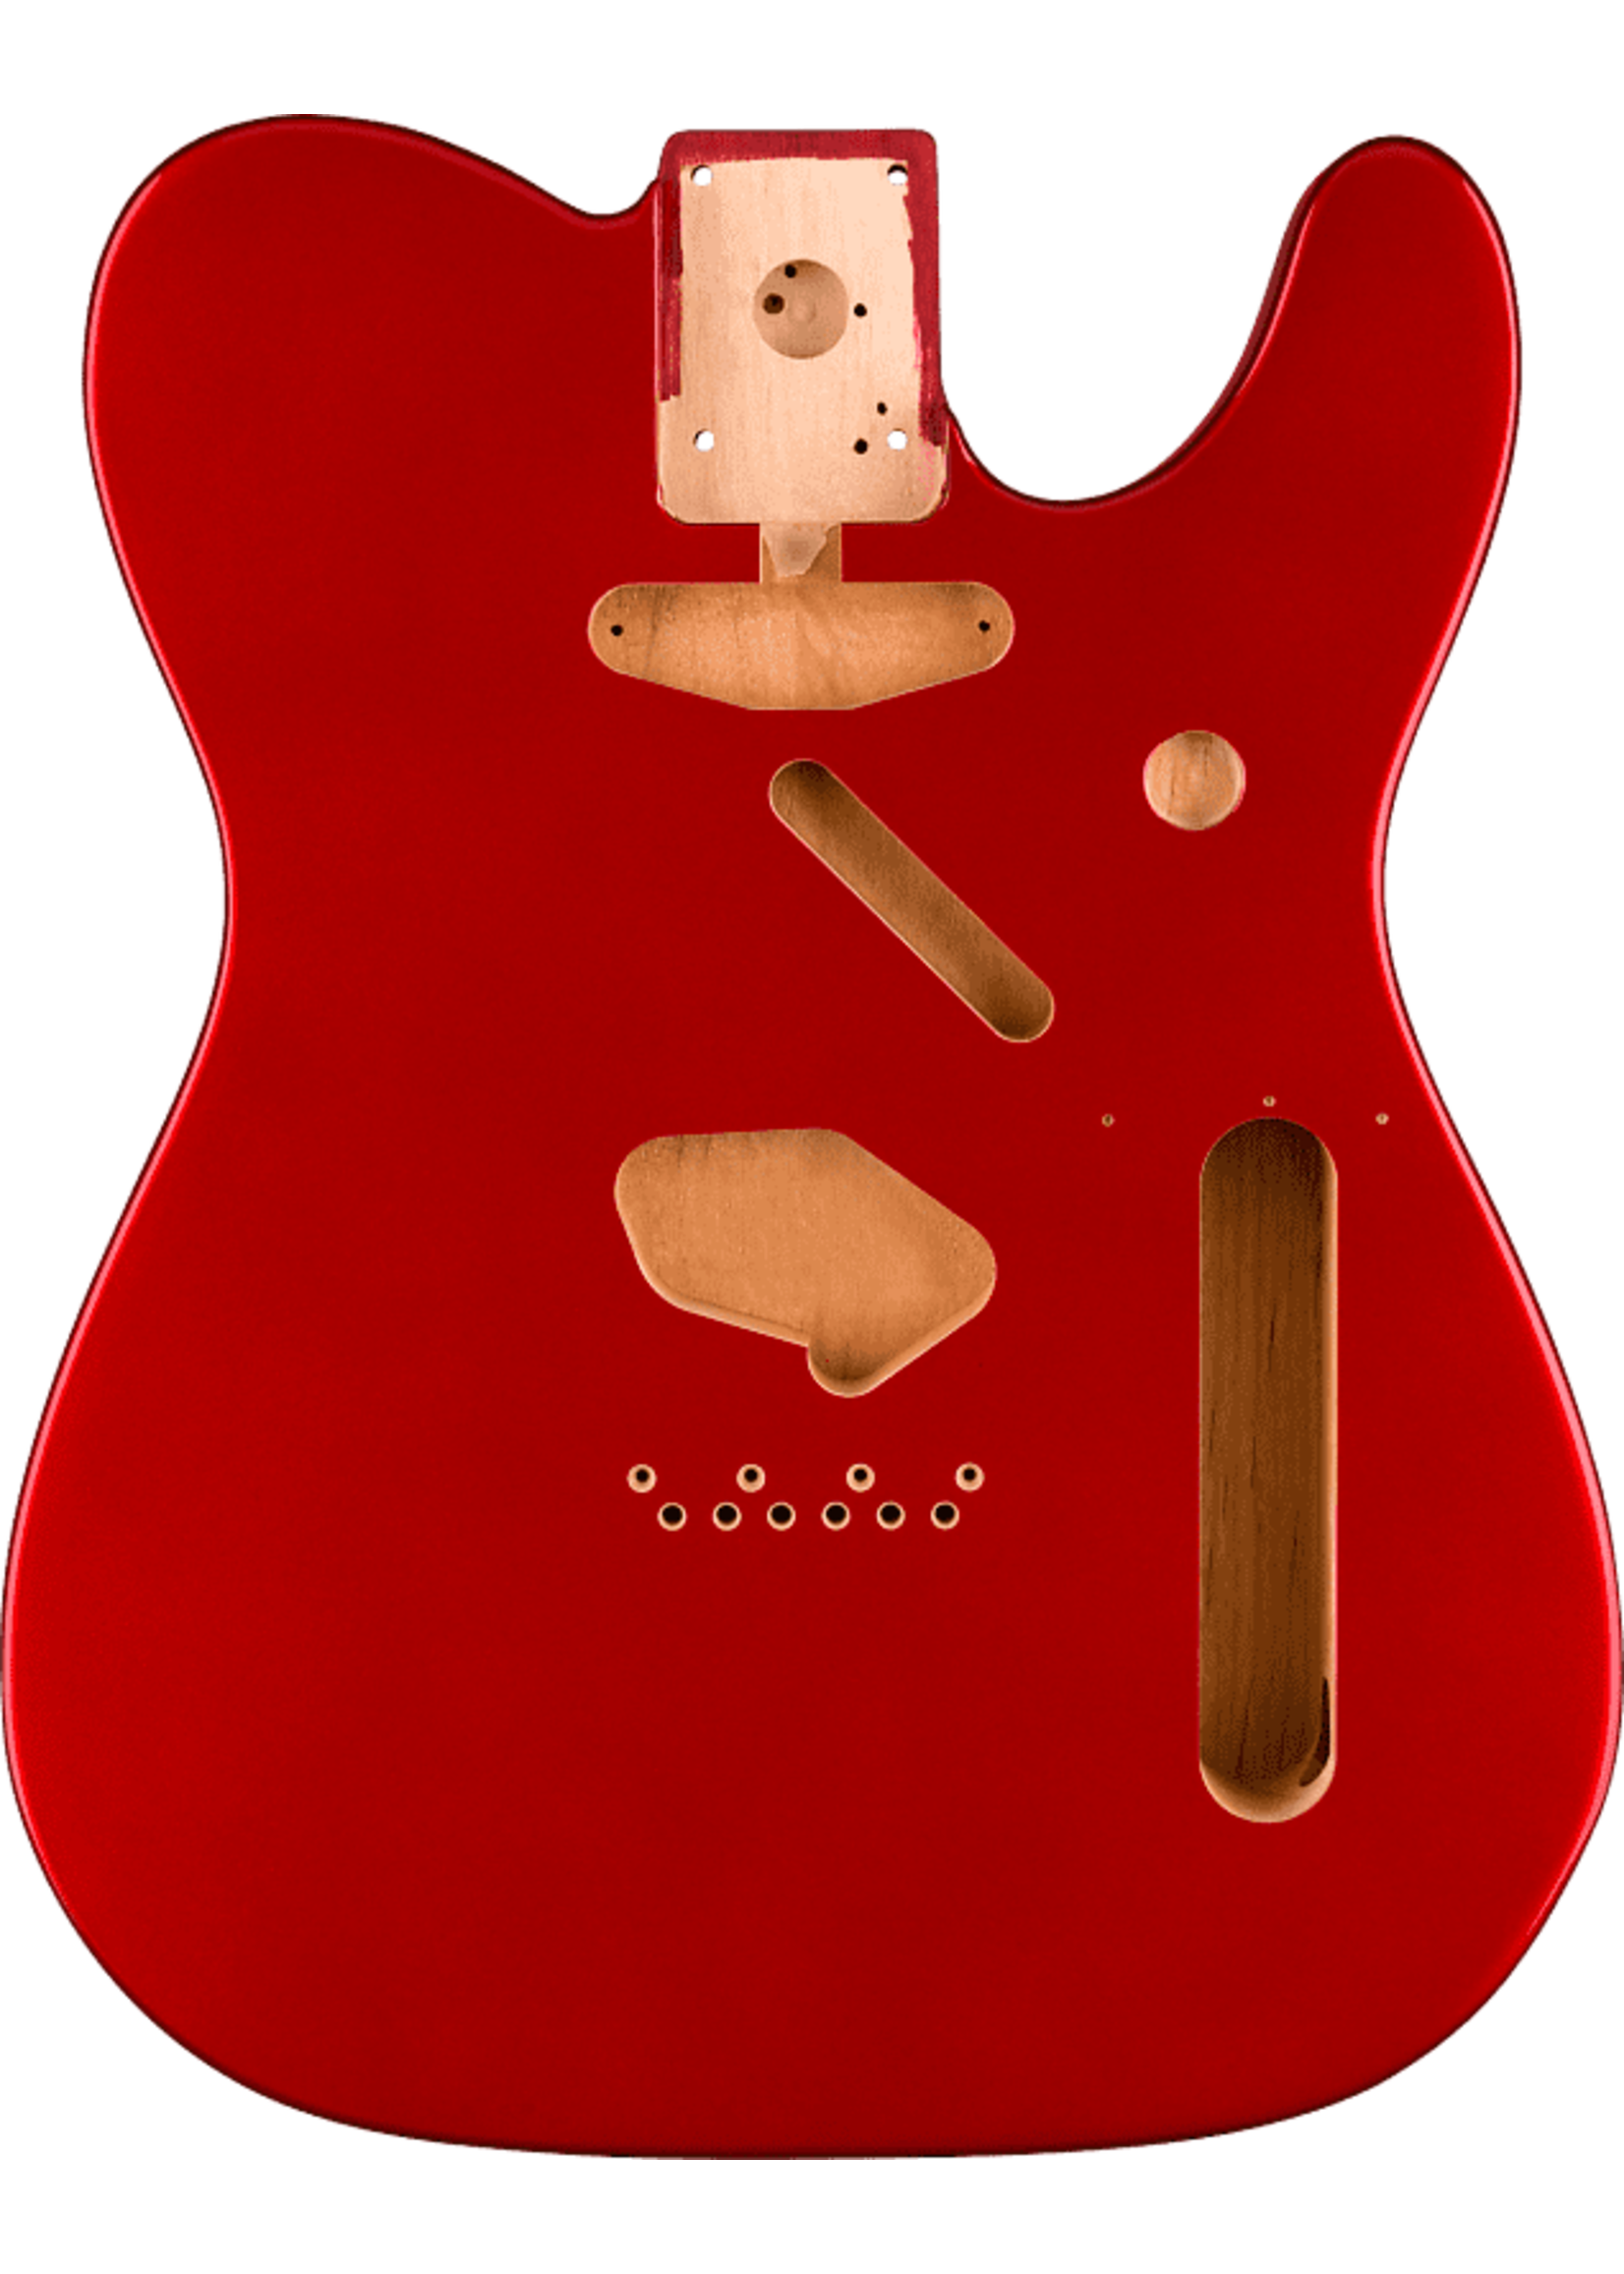 Fender Fender Classic Series 60's Telecaster® SS Alder Body Vintage Bridge Mount, Candy Apple Red